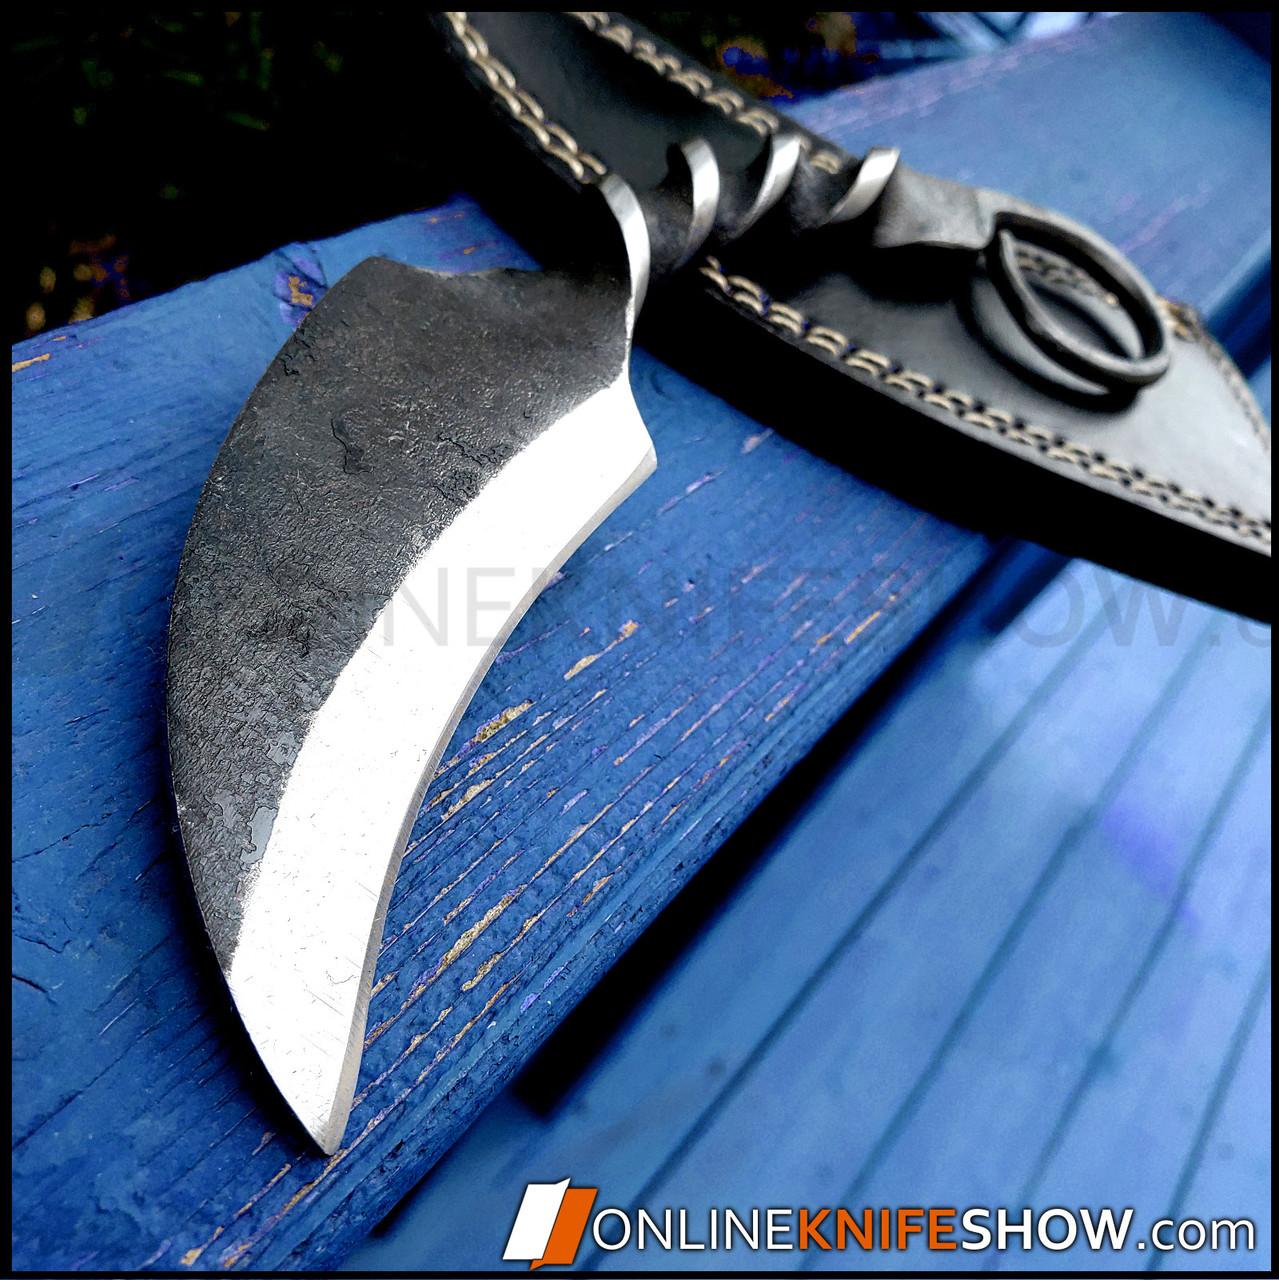 Hand Forged Railroad Spike Karambit Carbon Steel Fixed Blade Hunting Knife Sheath